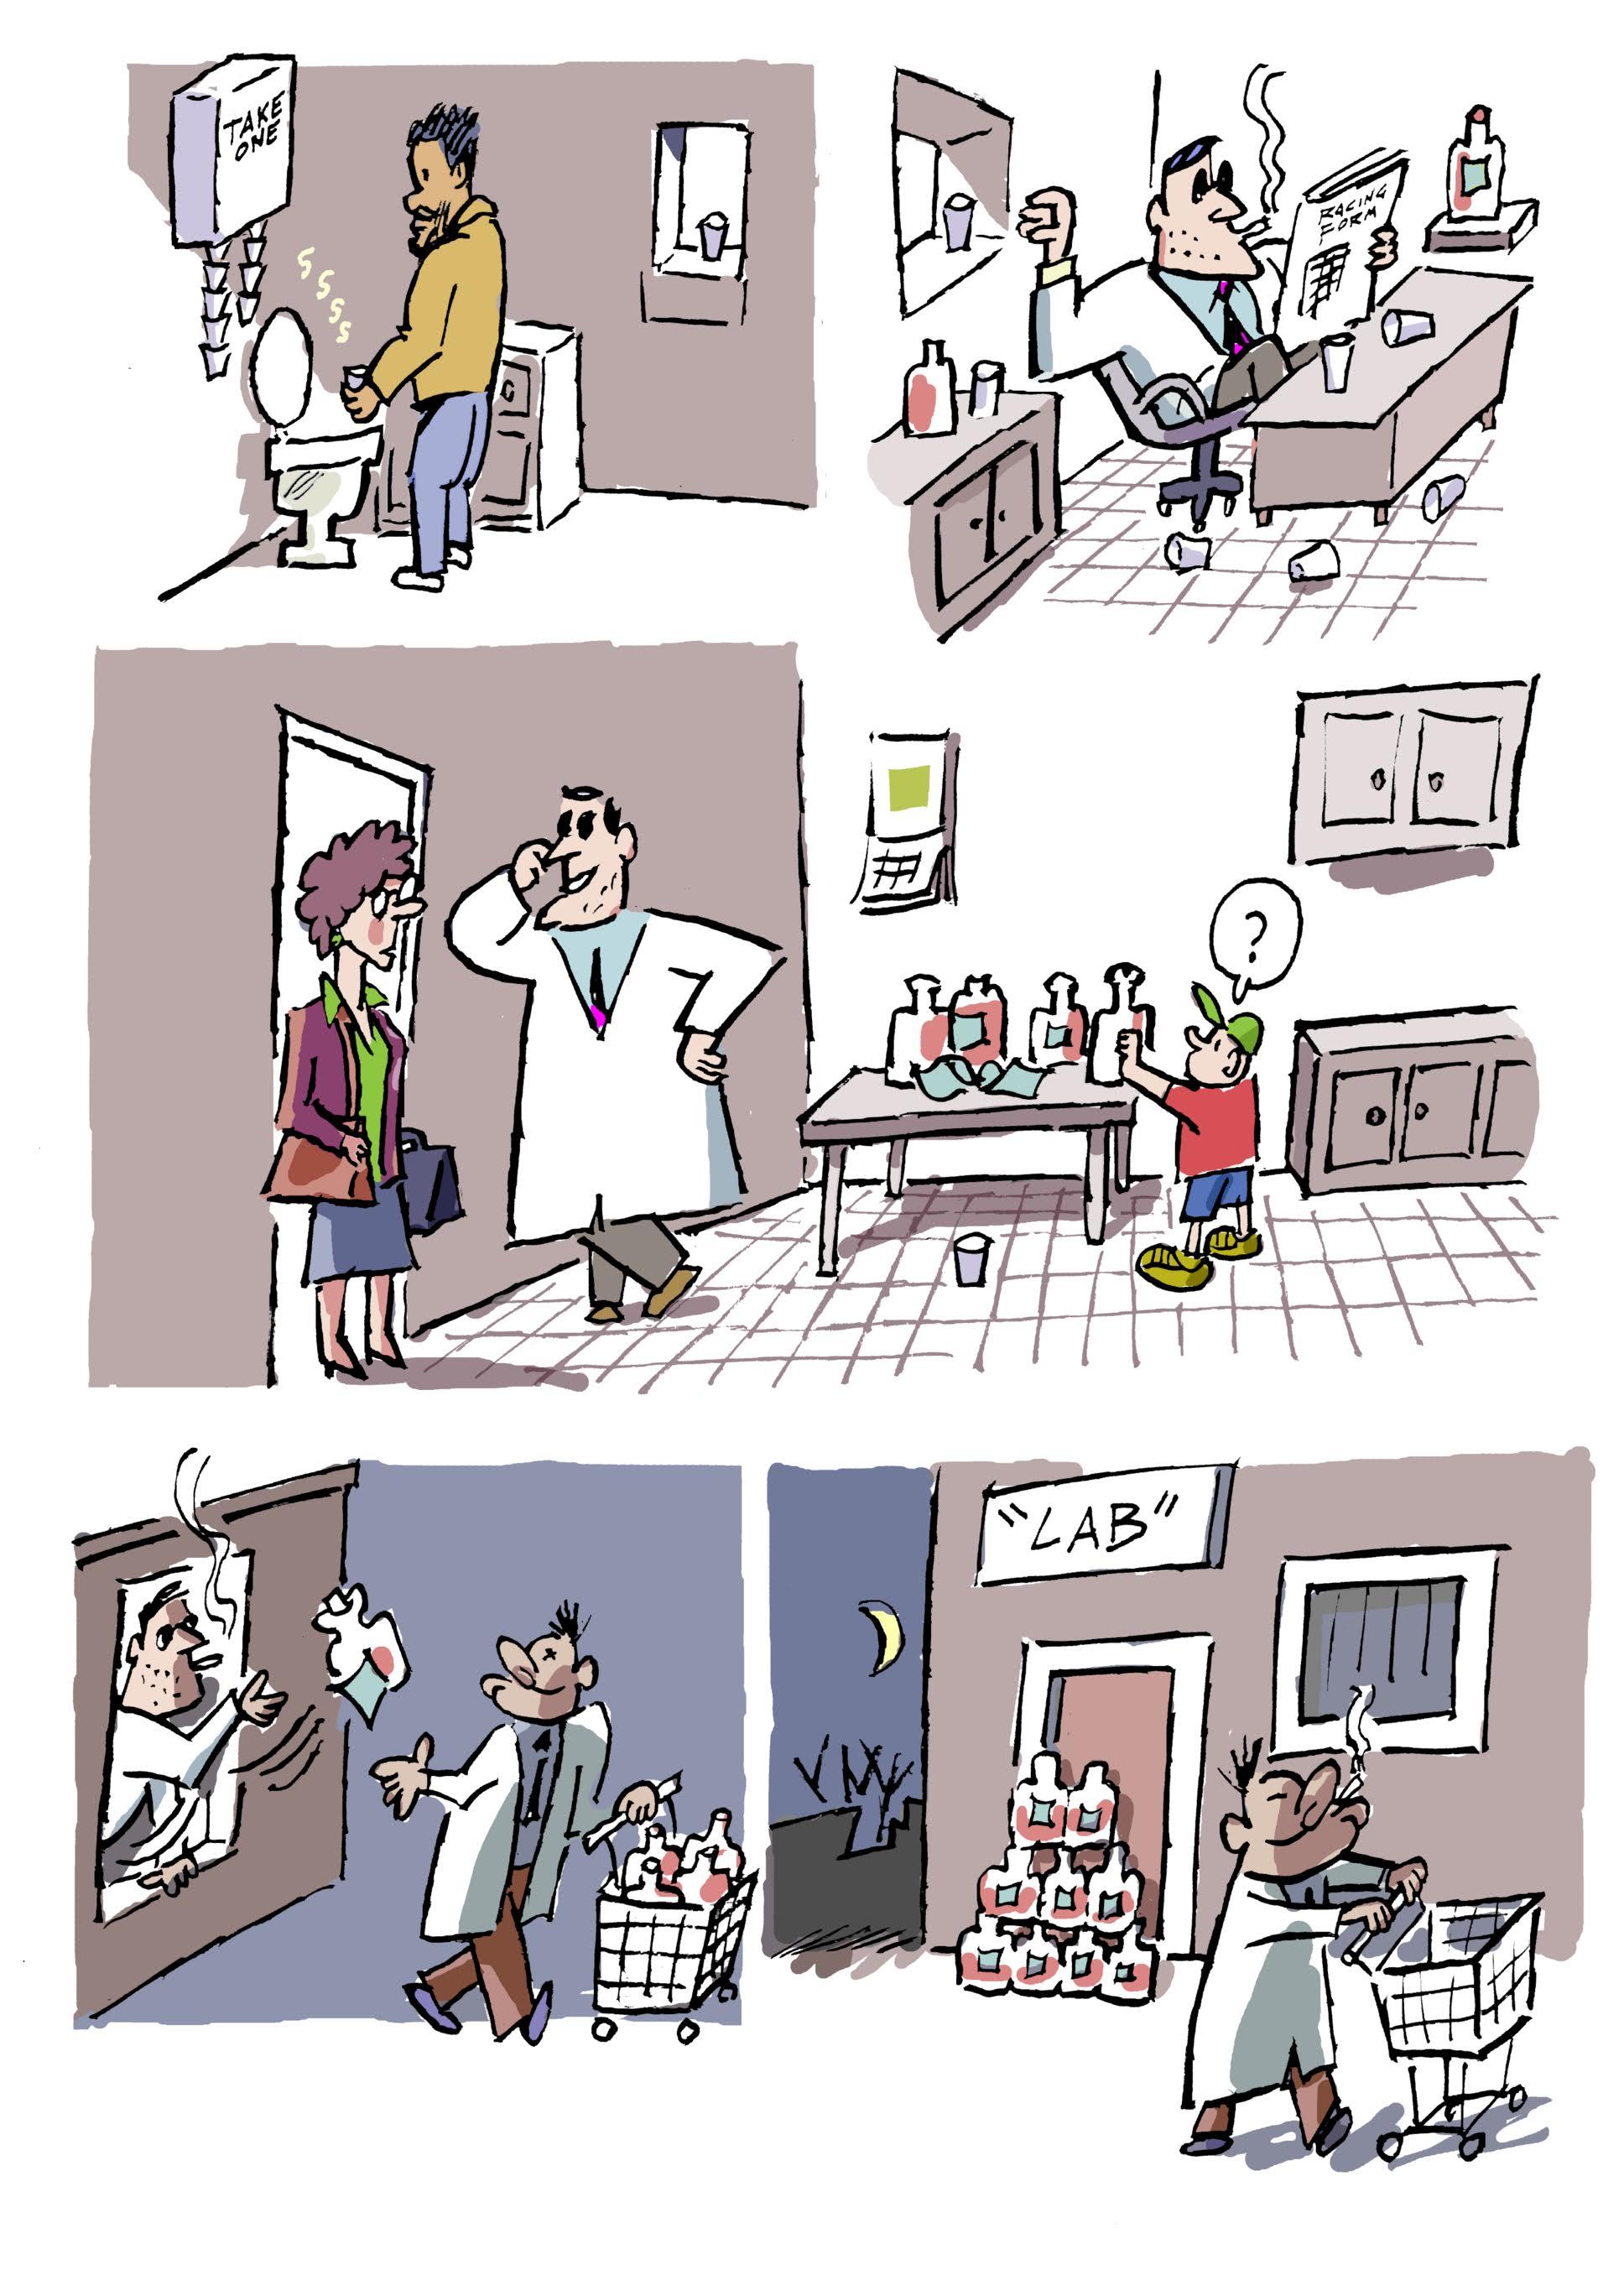 comic_drug_testing_-_Nick_Thorkelson.jpg